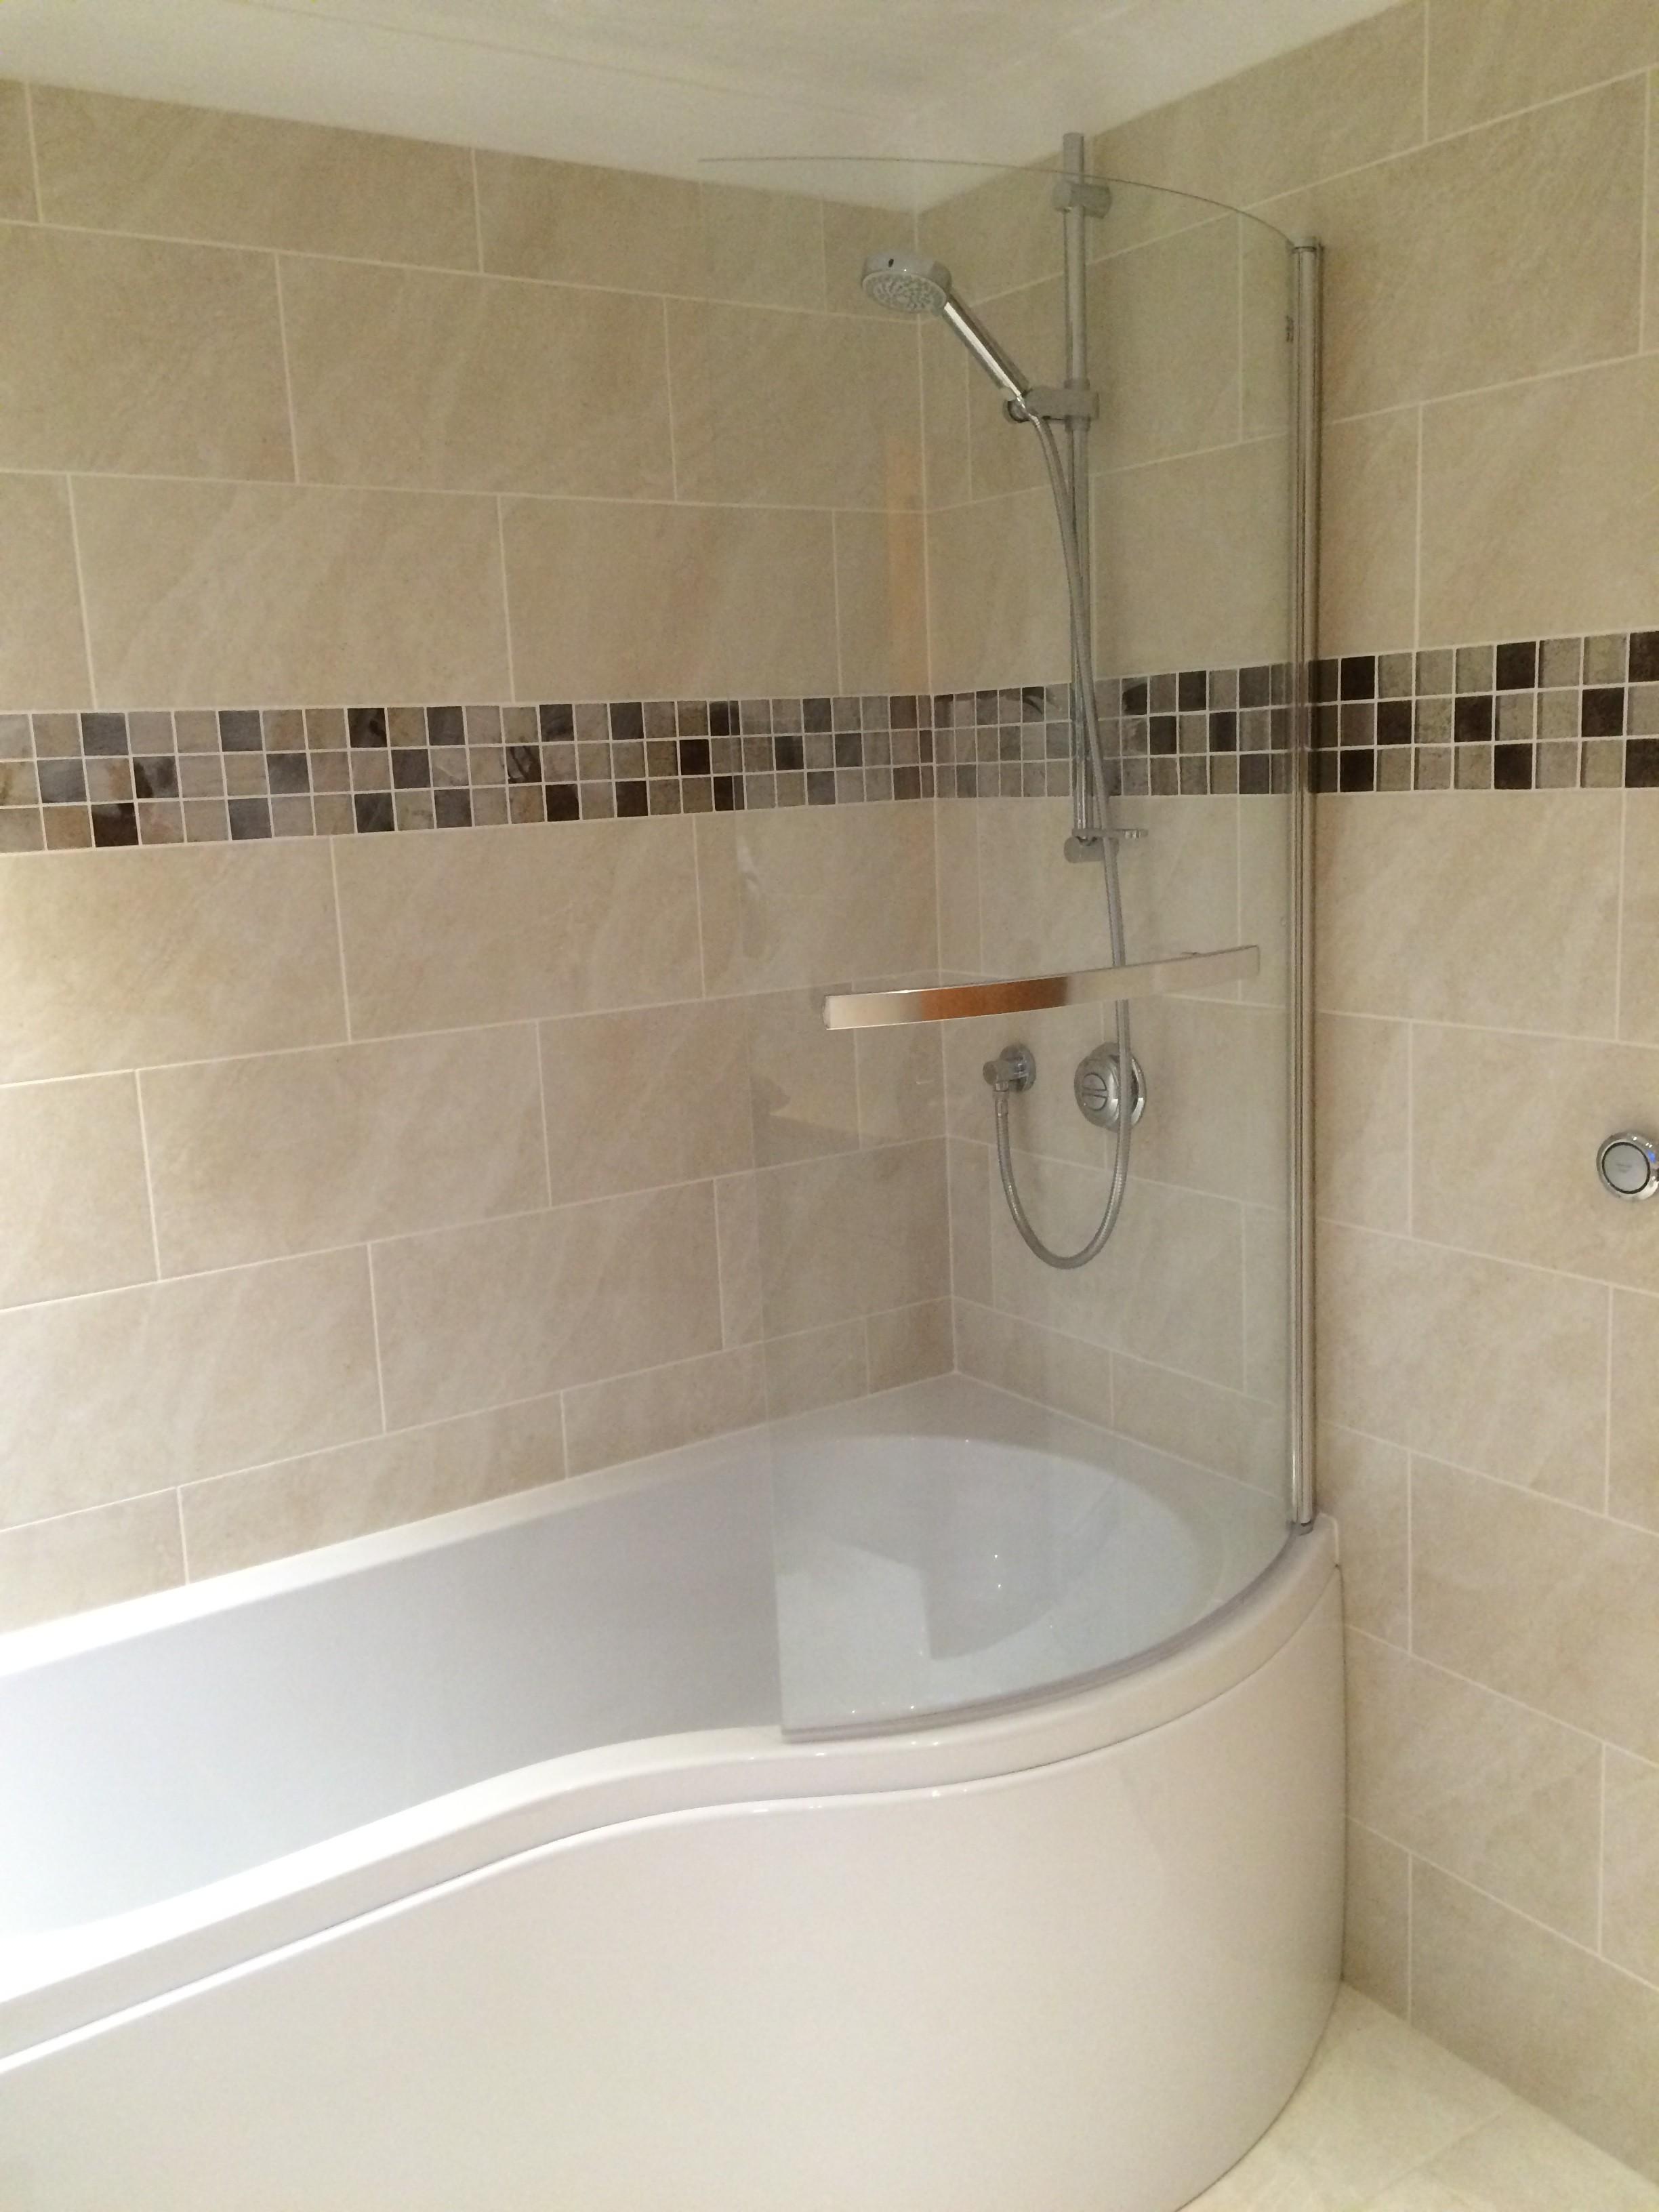 Bathroom refurbishment completed at Caythorpe